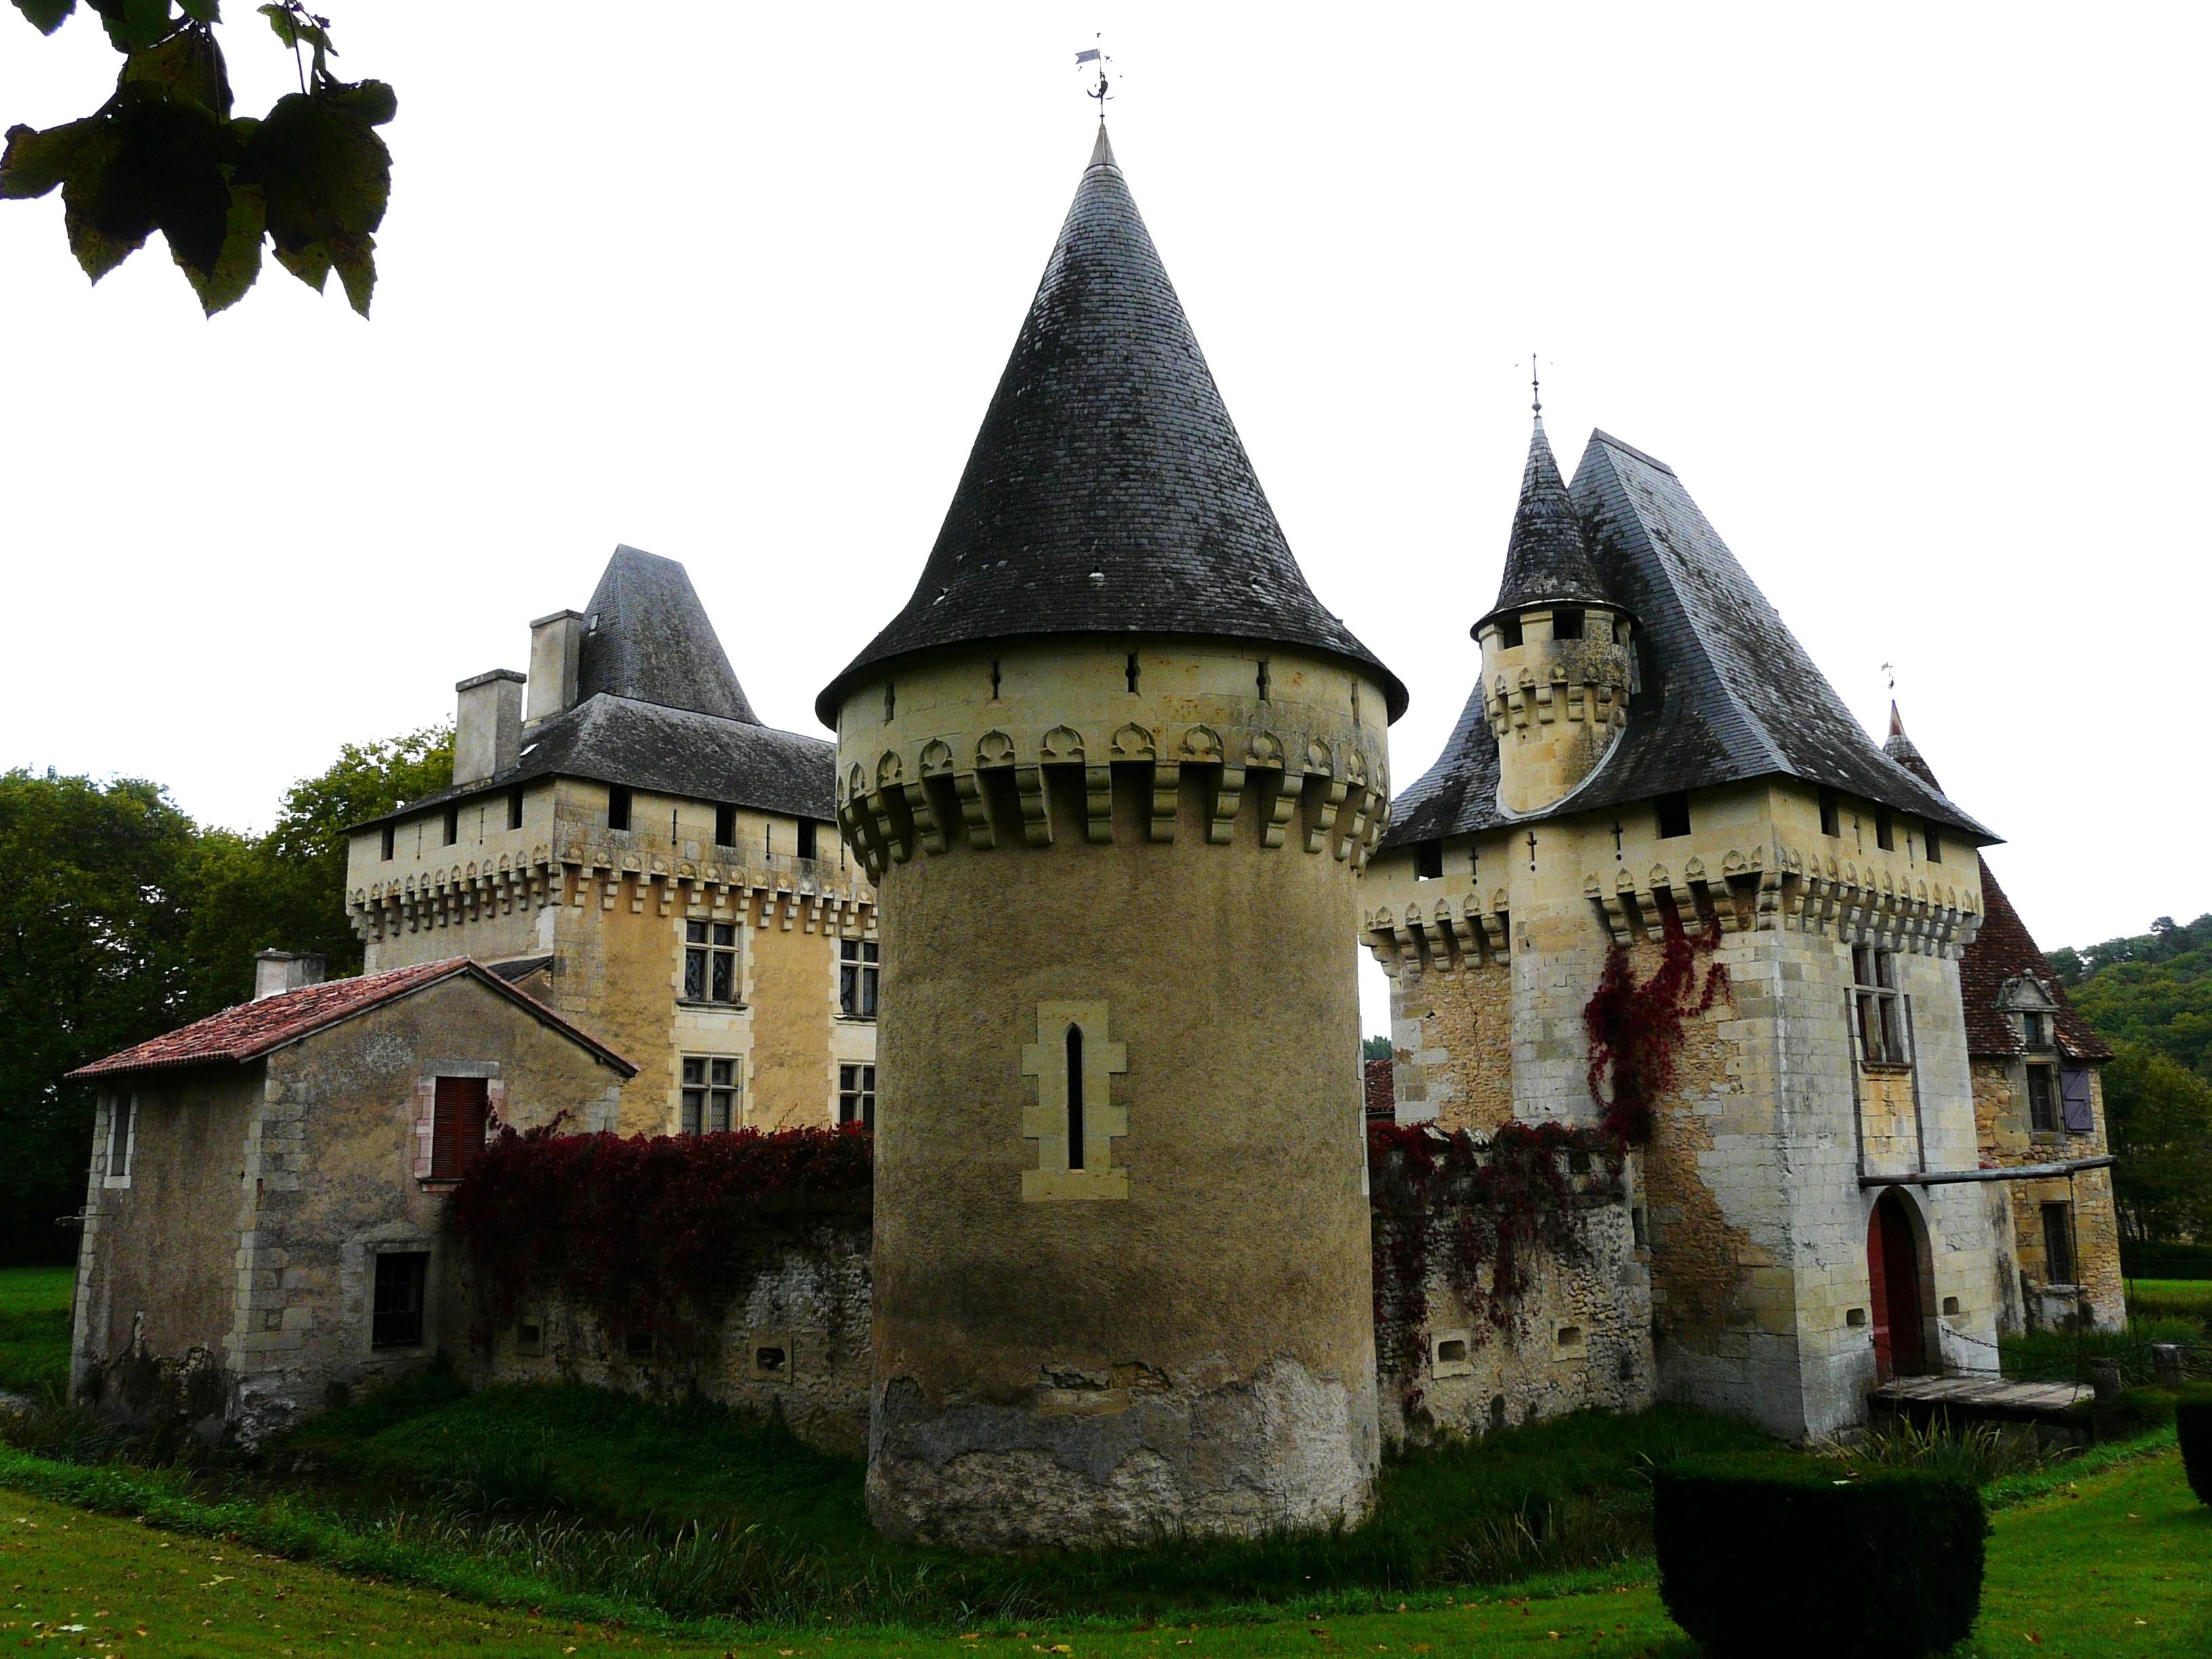 Boulazac France  city pictures gallery : Fichier:Boulazac Lieu Dieu 29 — Wikipédia